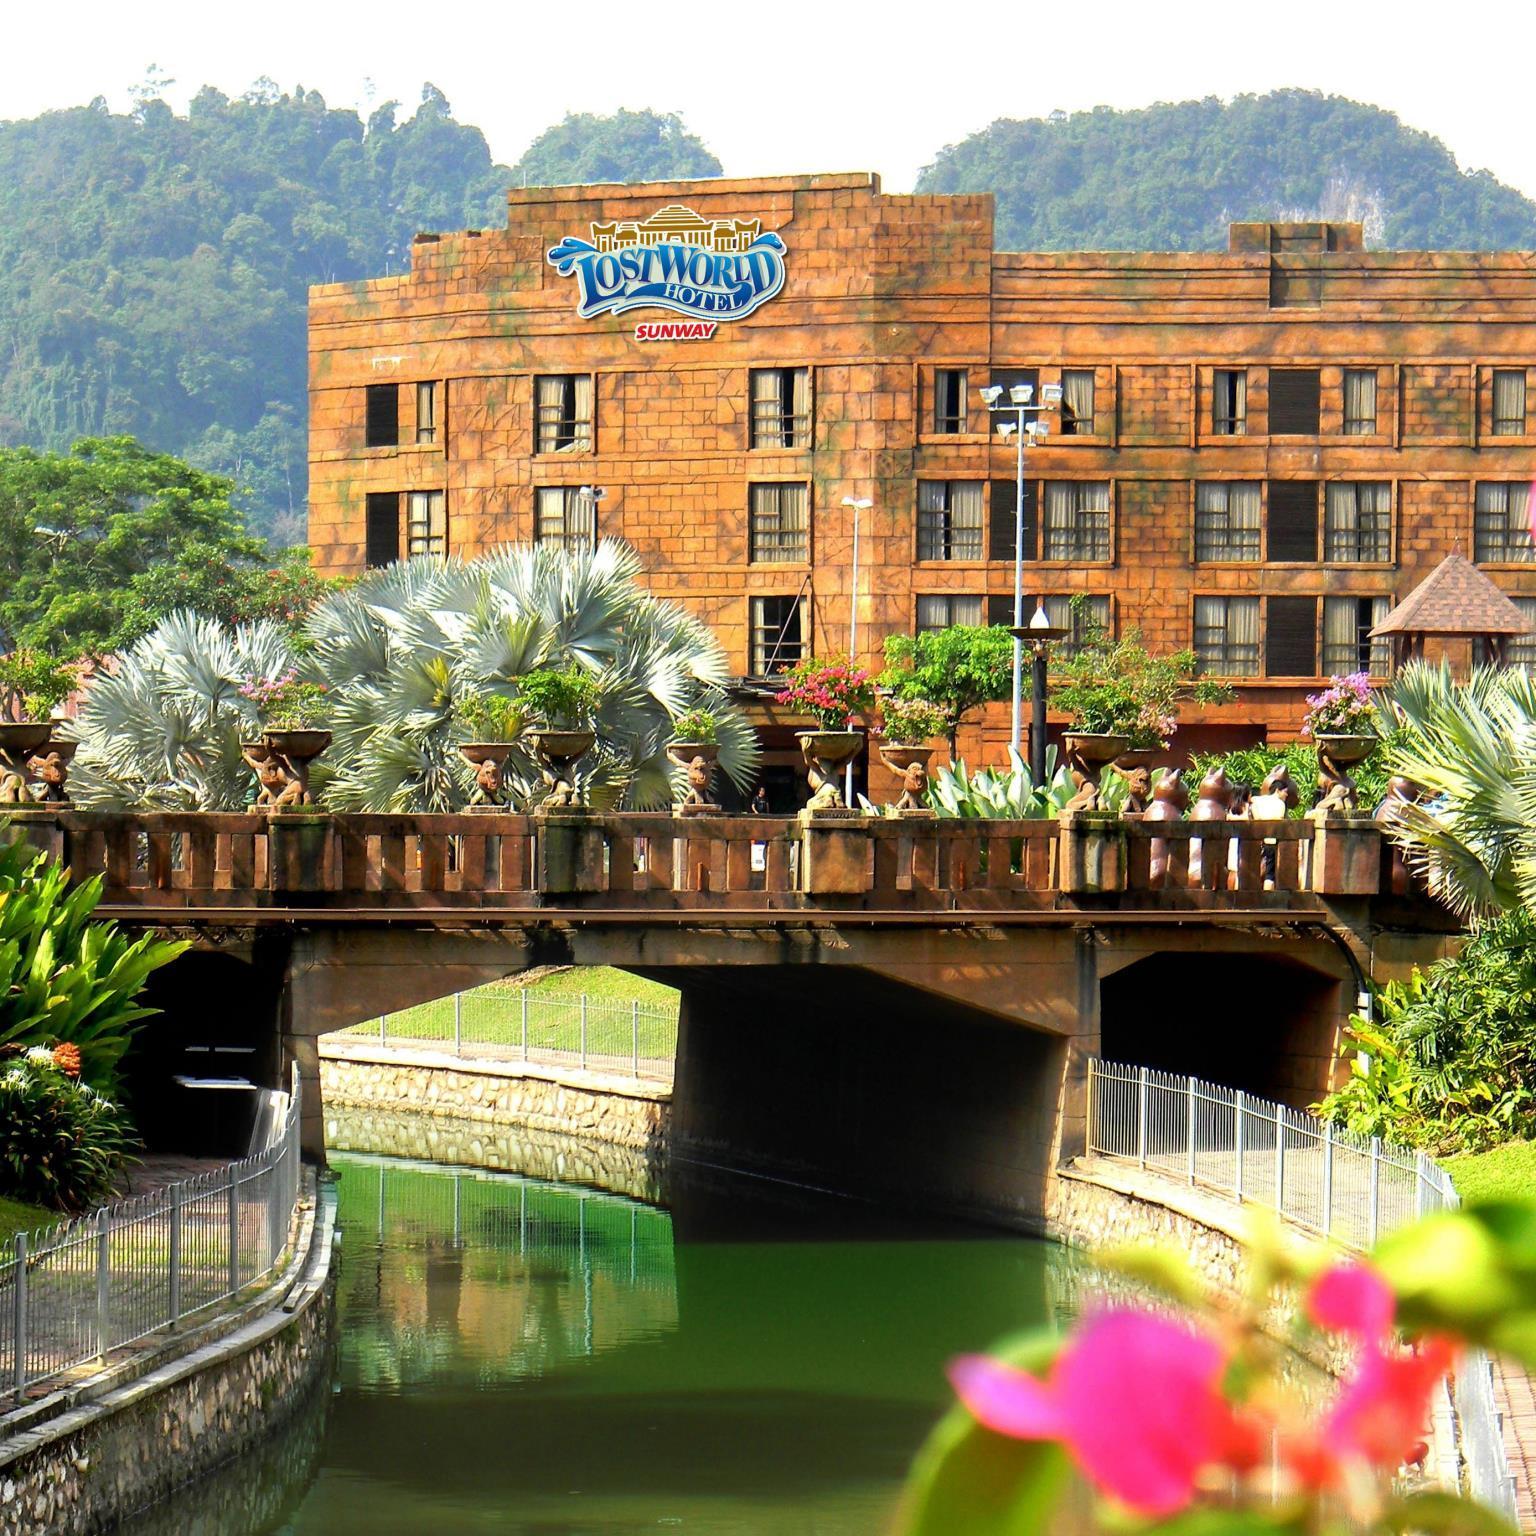 Sunway Lost World Hotel, Kinta